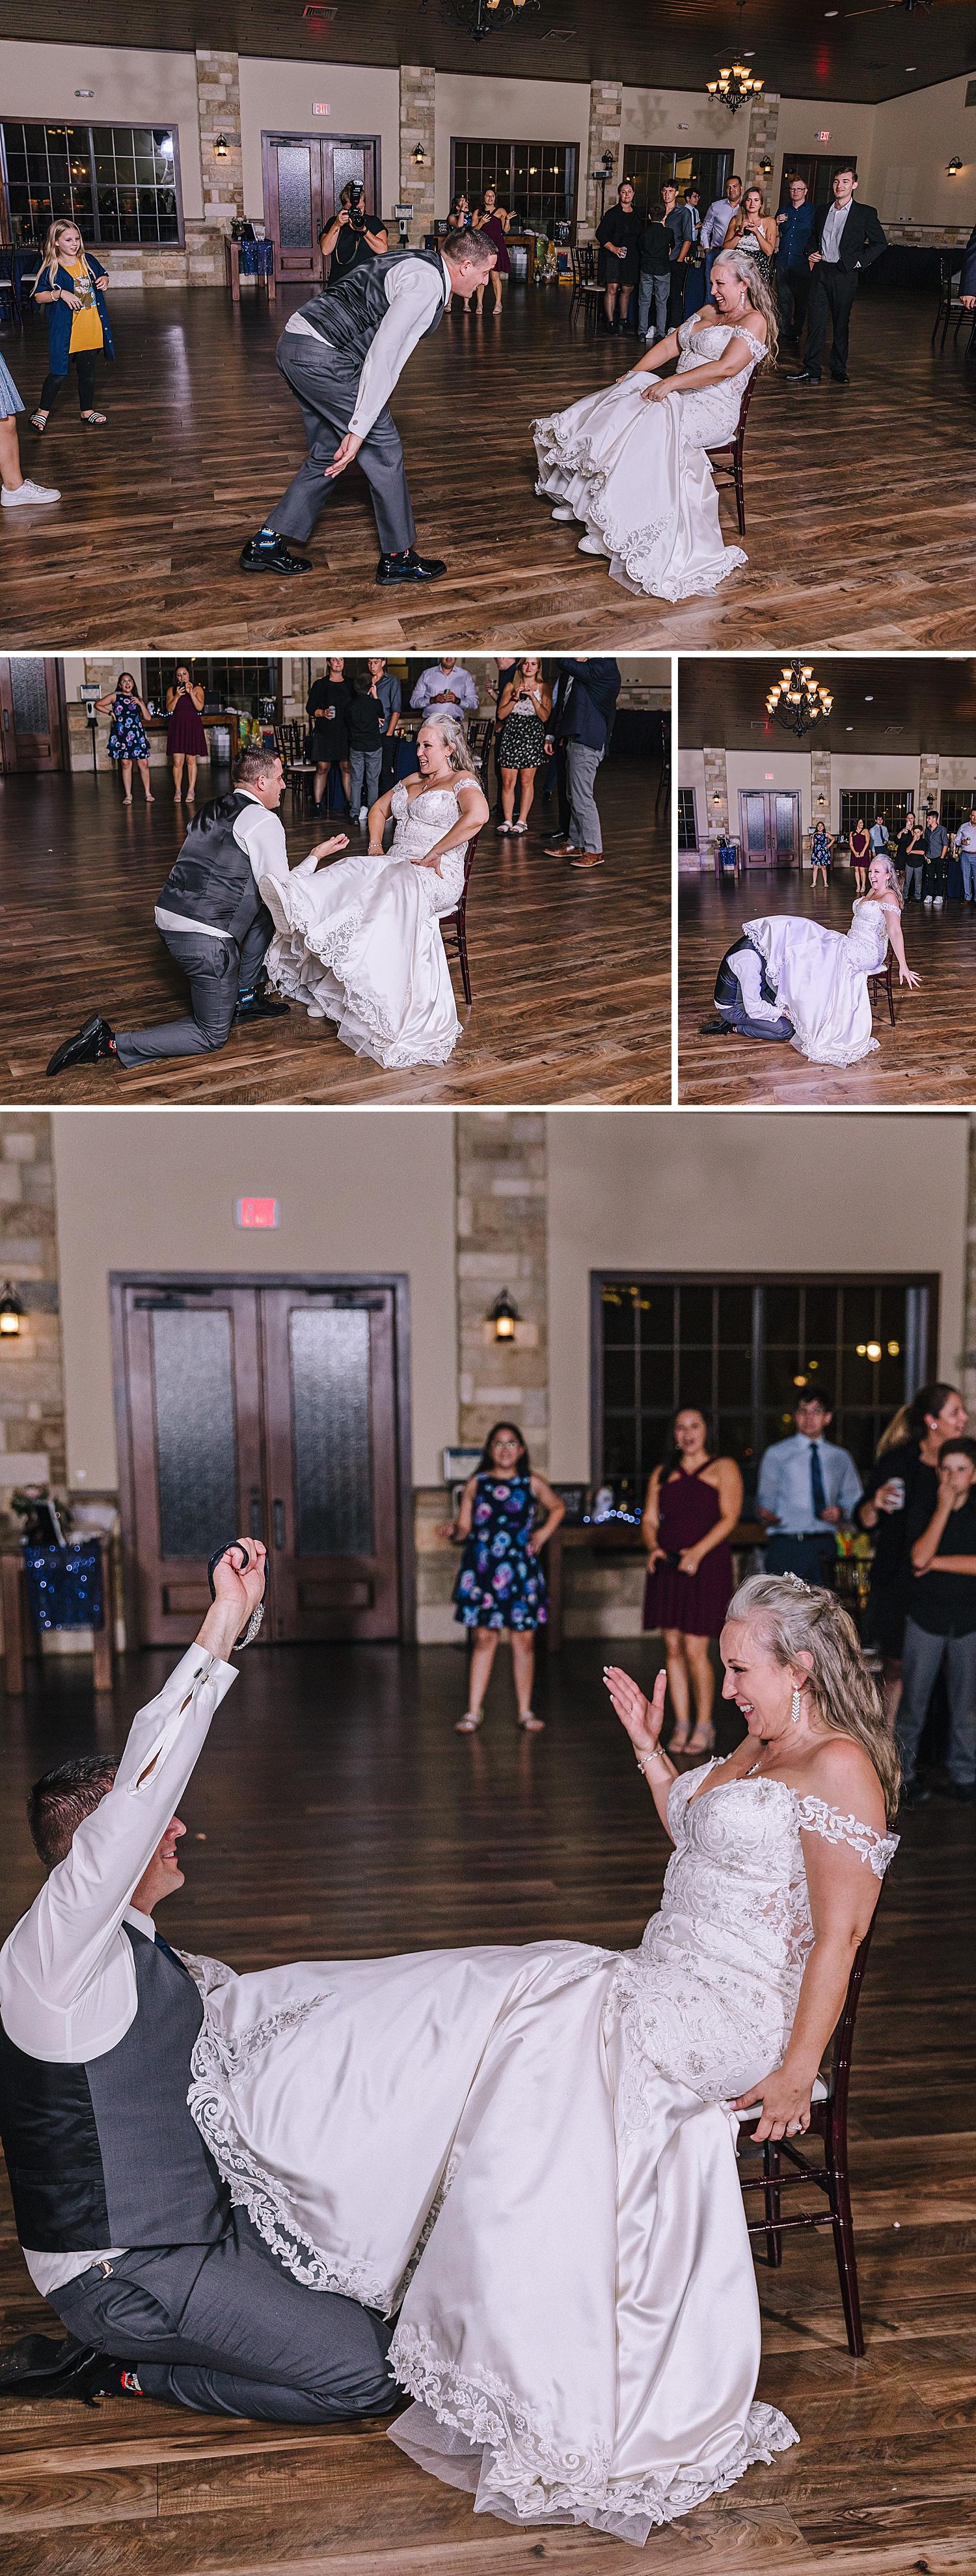 The-Club-at-Garden-Ridge-Military-Wedding-Carly-Barton-Photography_0102.jpg